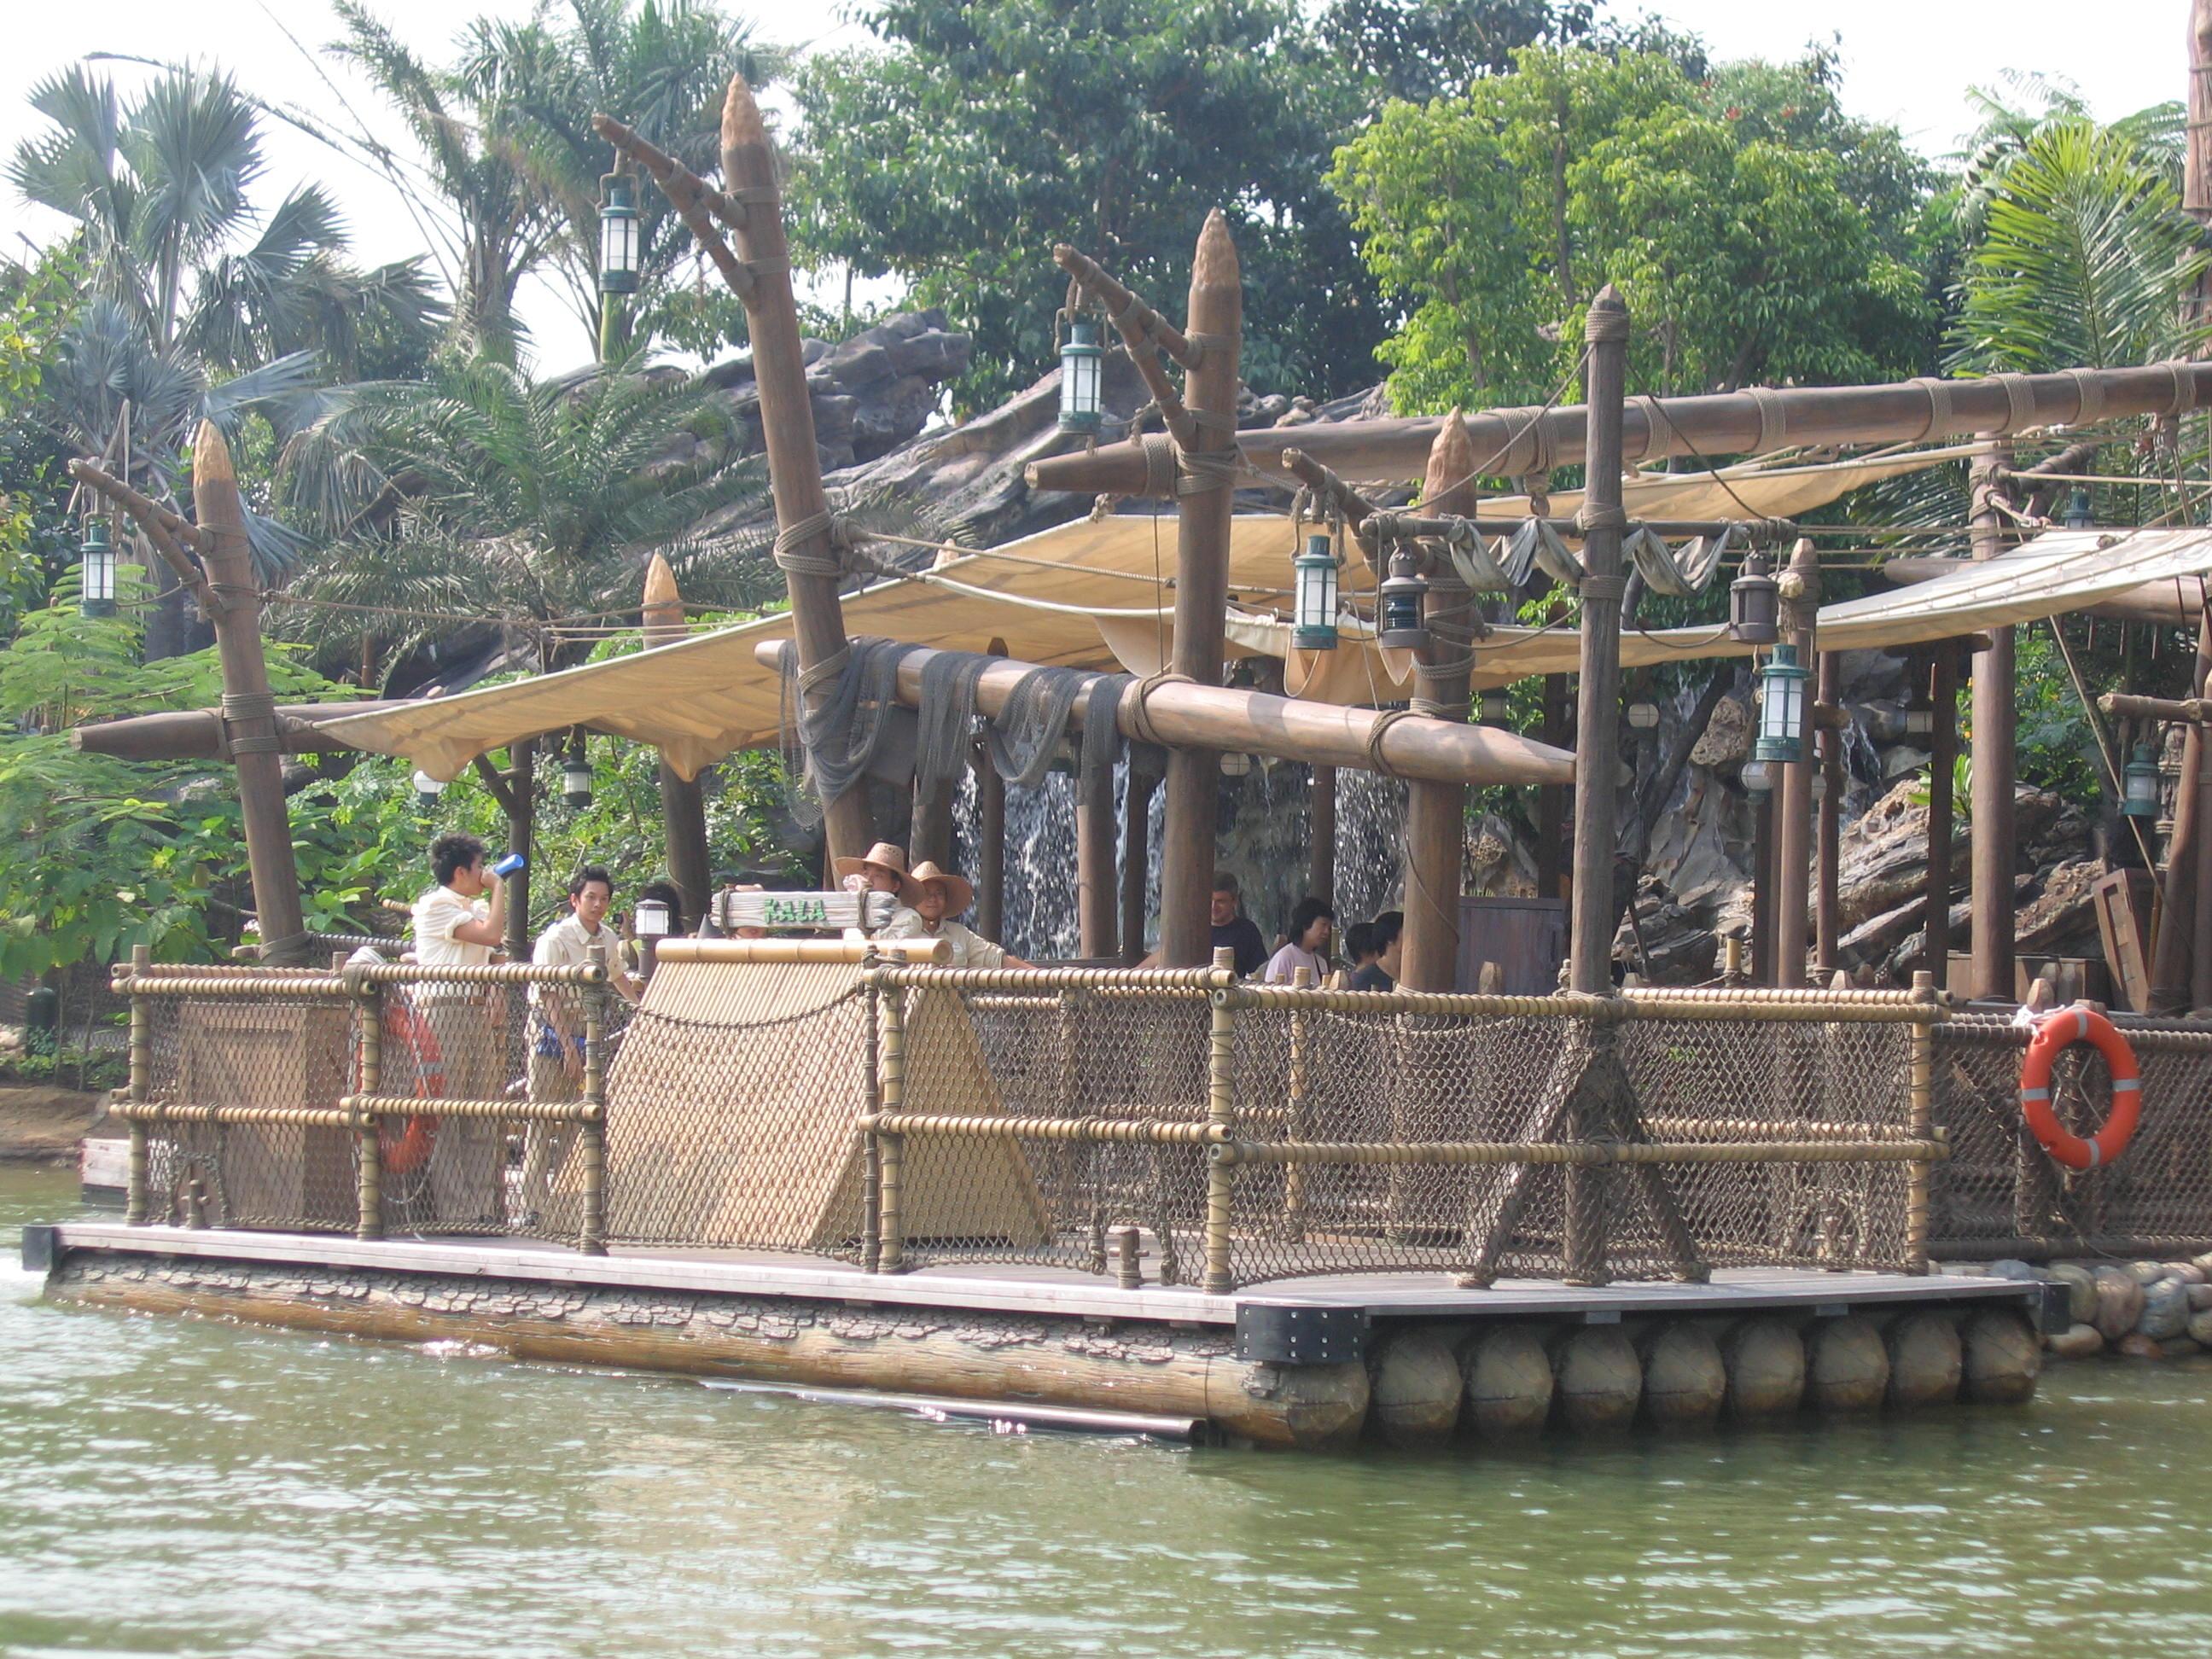 File:Hkdl raft tarzan's tree house.jpg - Wikimedia Commons